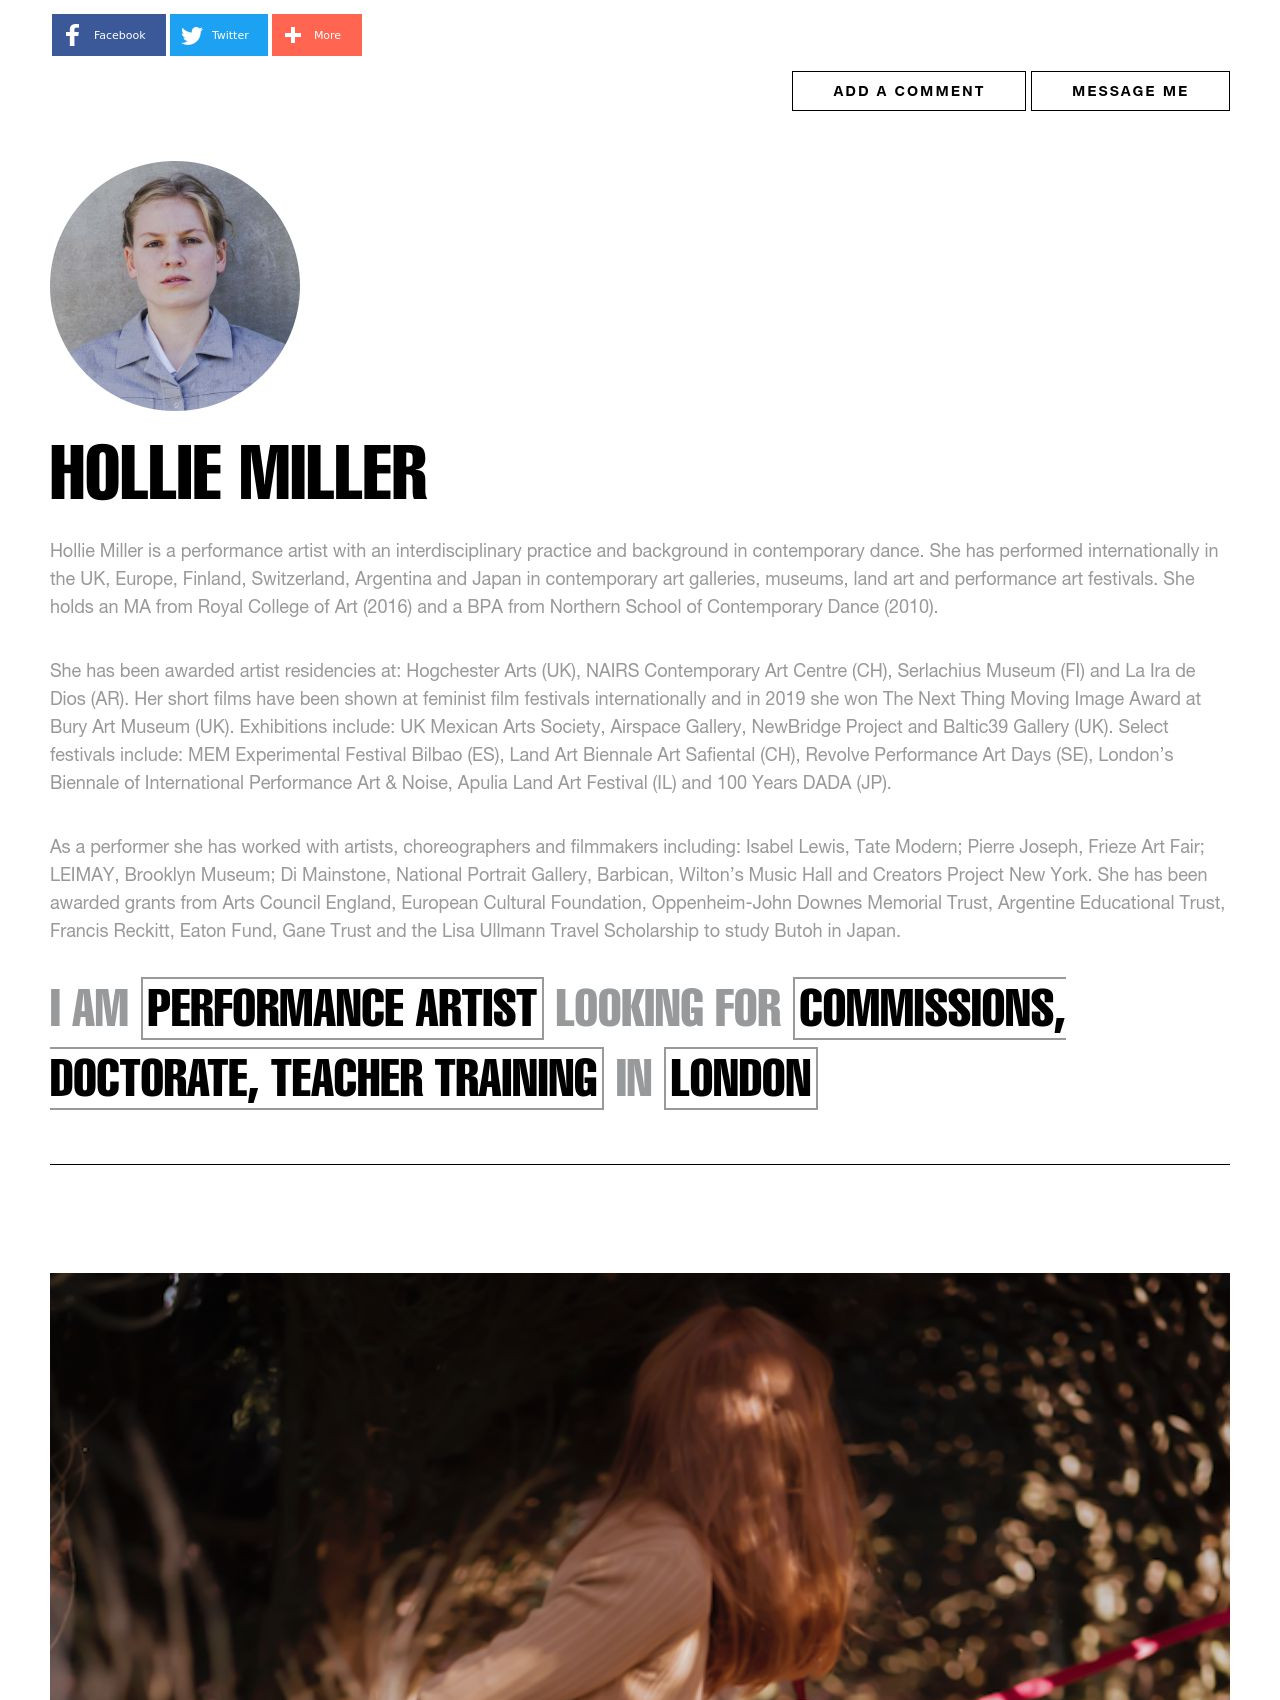 Hollie Miller